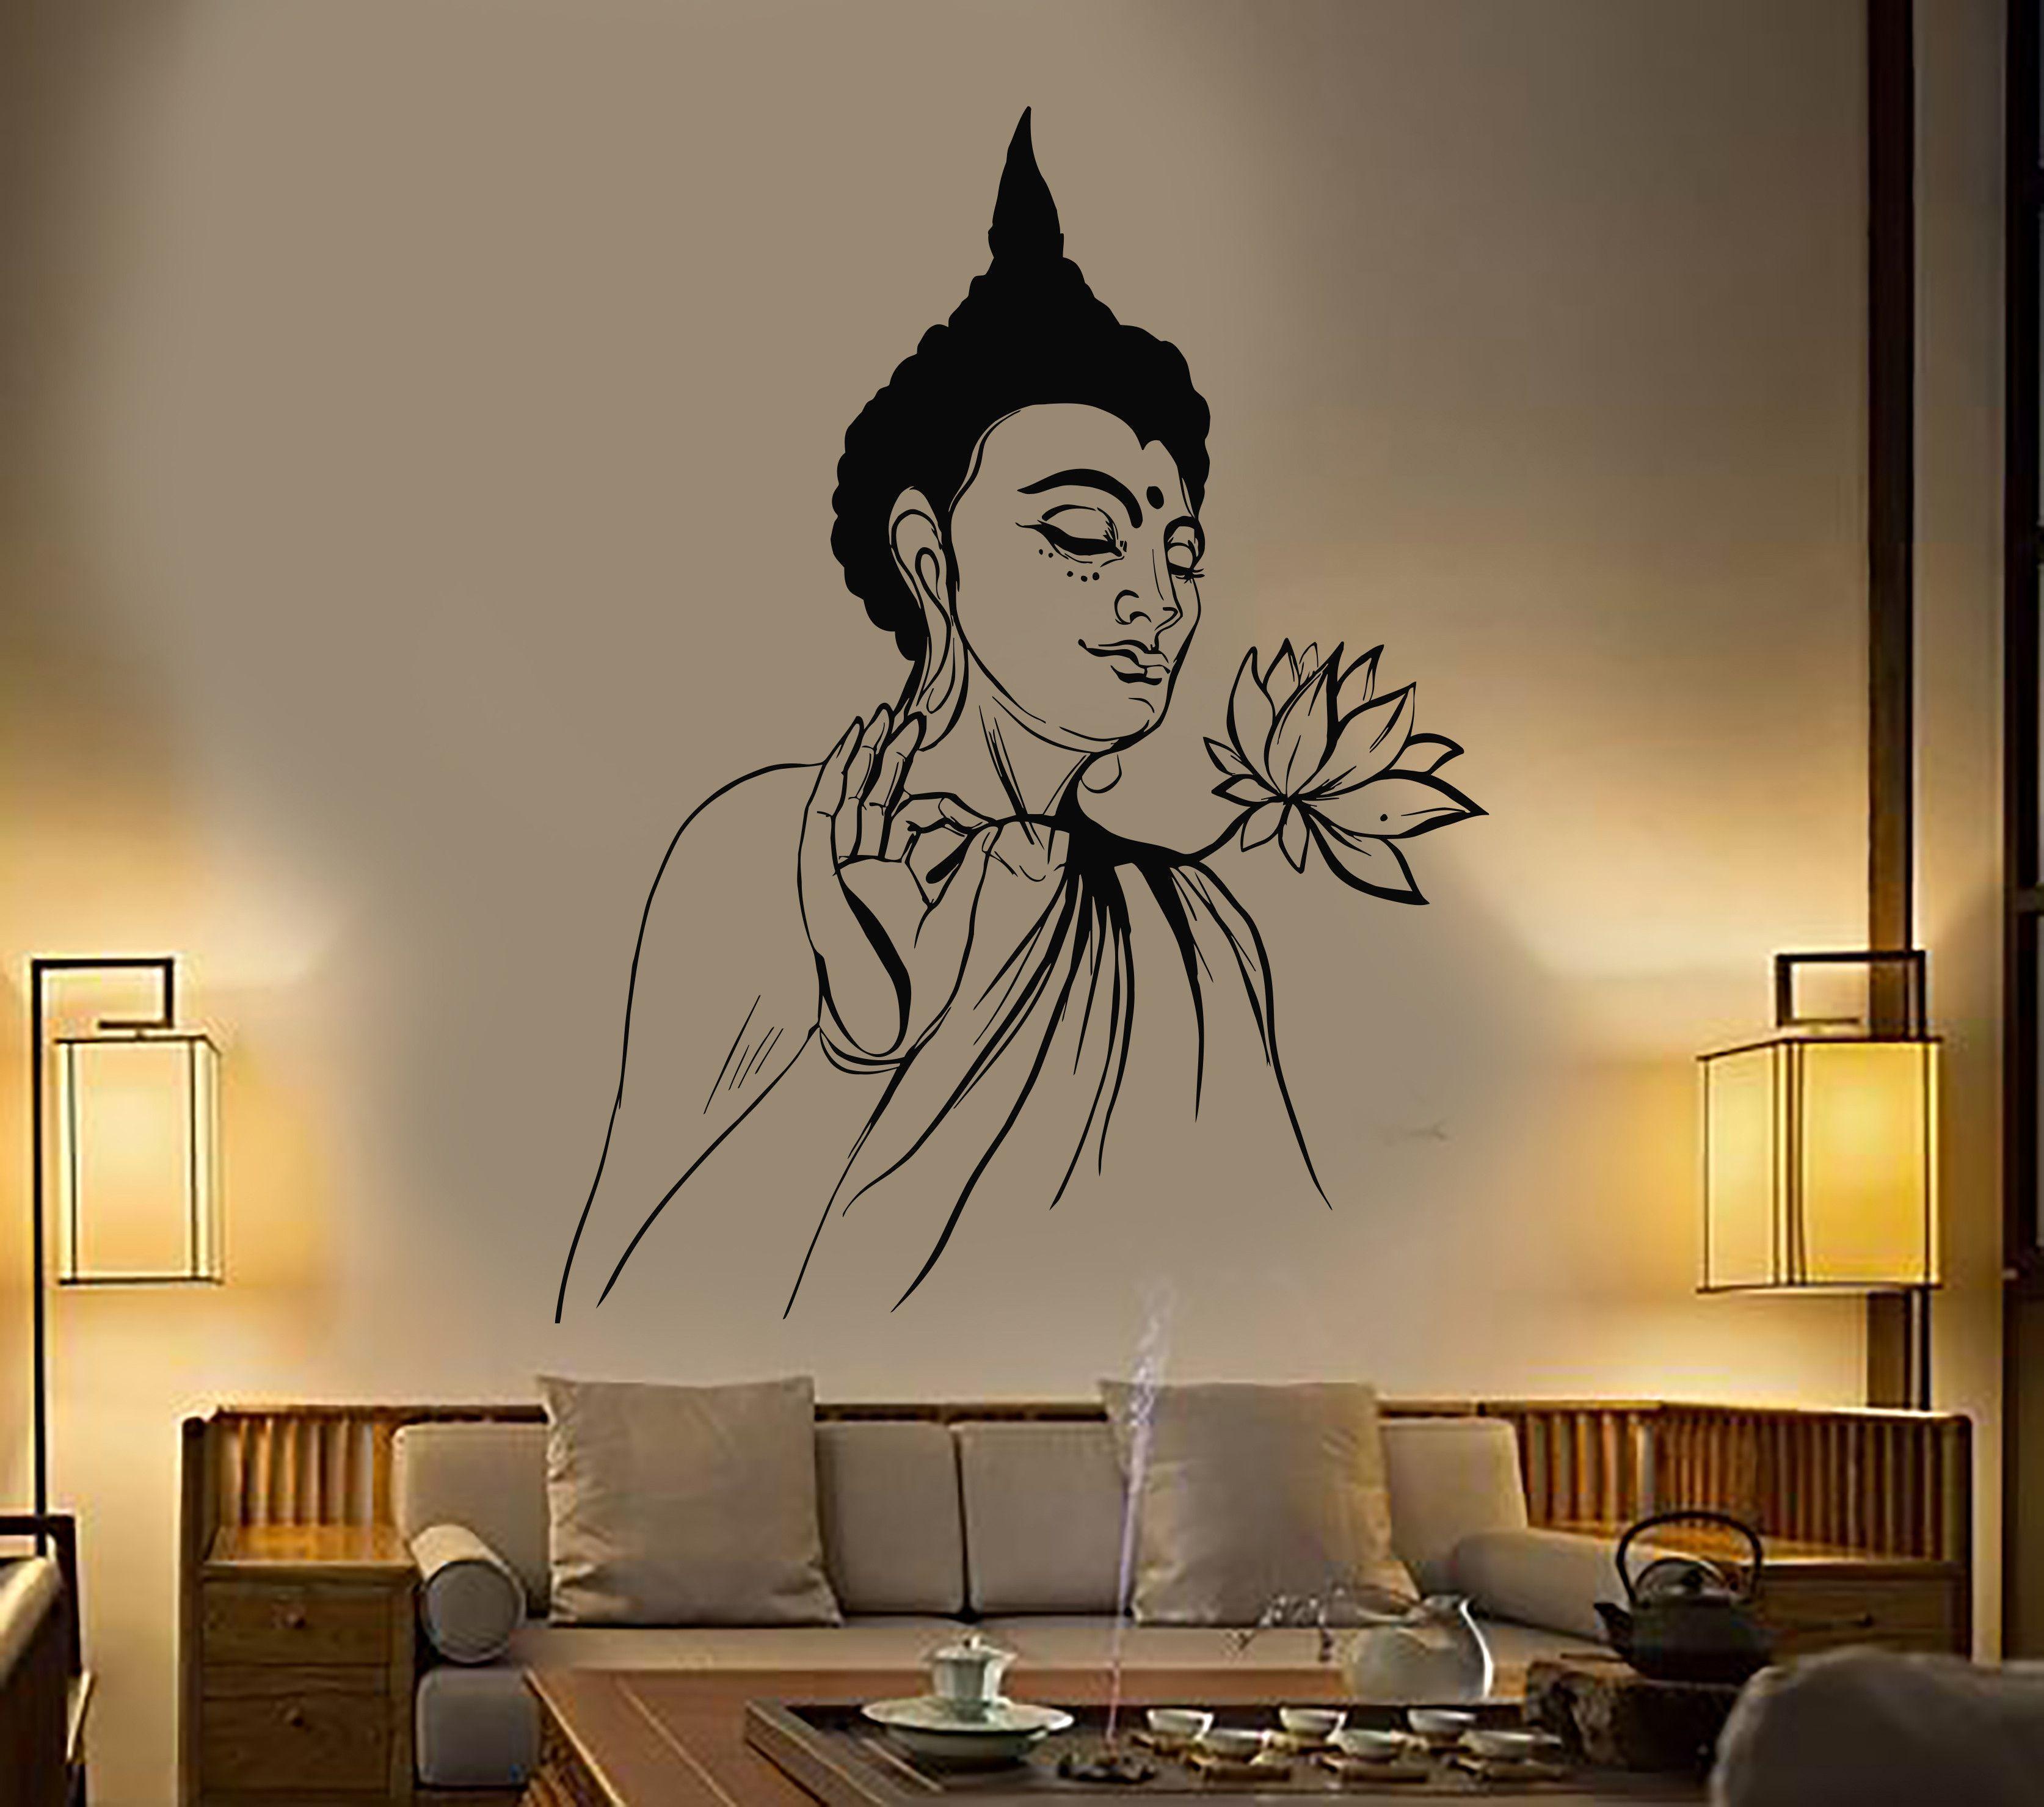 Vinyl Wall Decal Buddha Lotus Flower Buddhism Yoga Meditation - Zen wall decalsvinyl wall decal yin yang yoga zen meditation bedroom decor